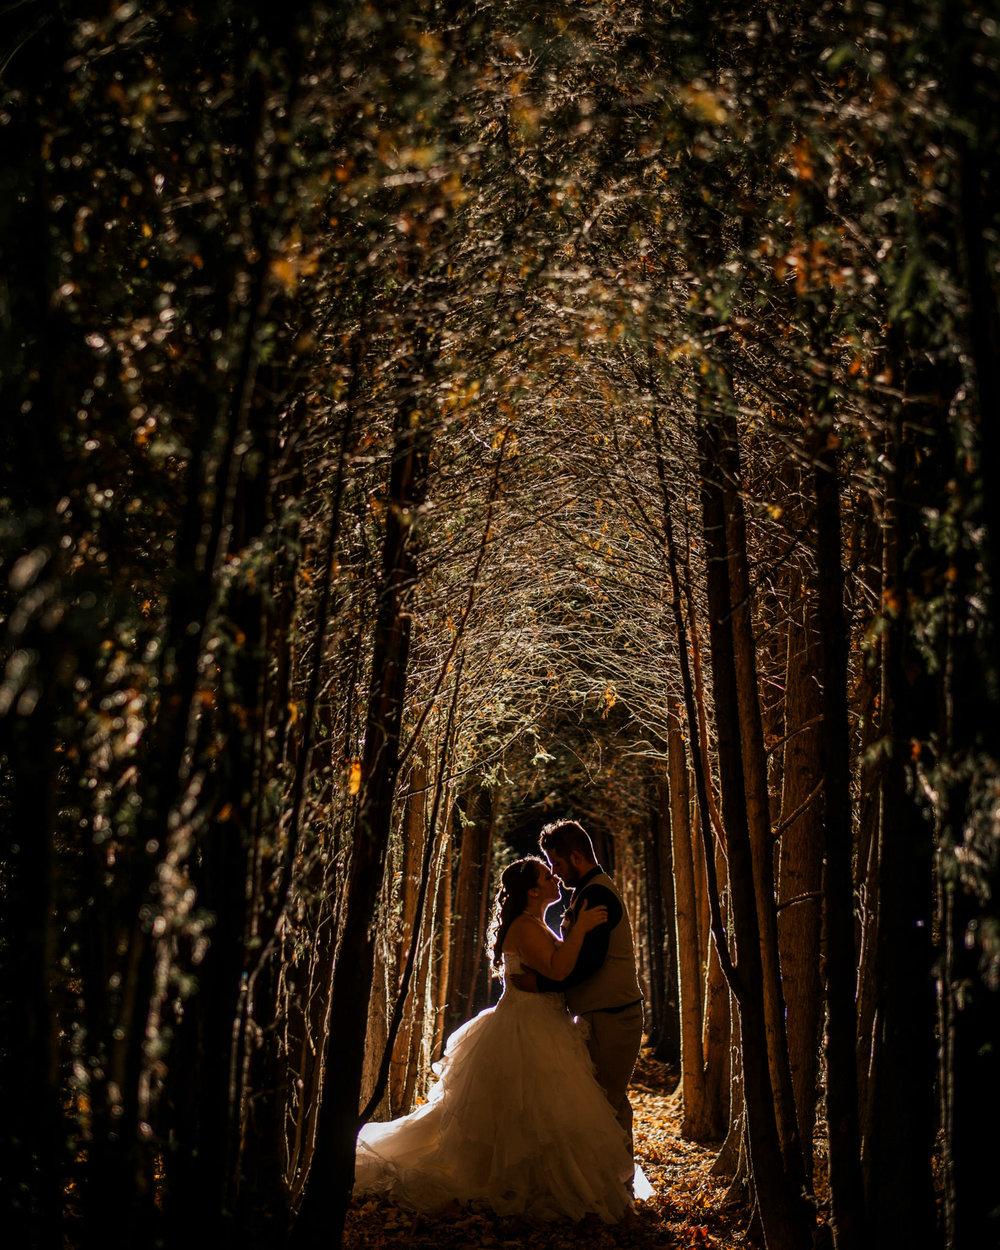 tree-tunnel-night-portrait-001.jpg